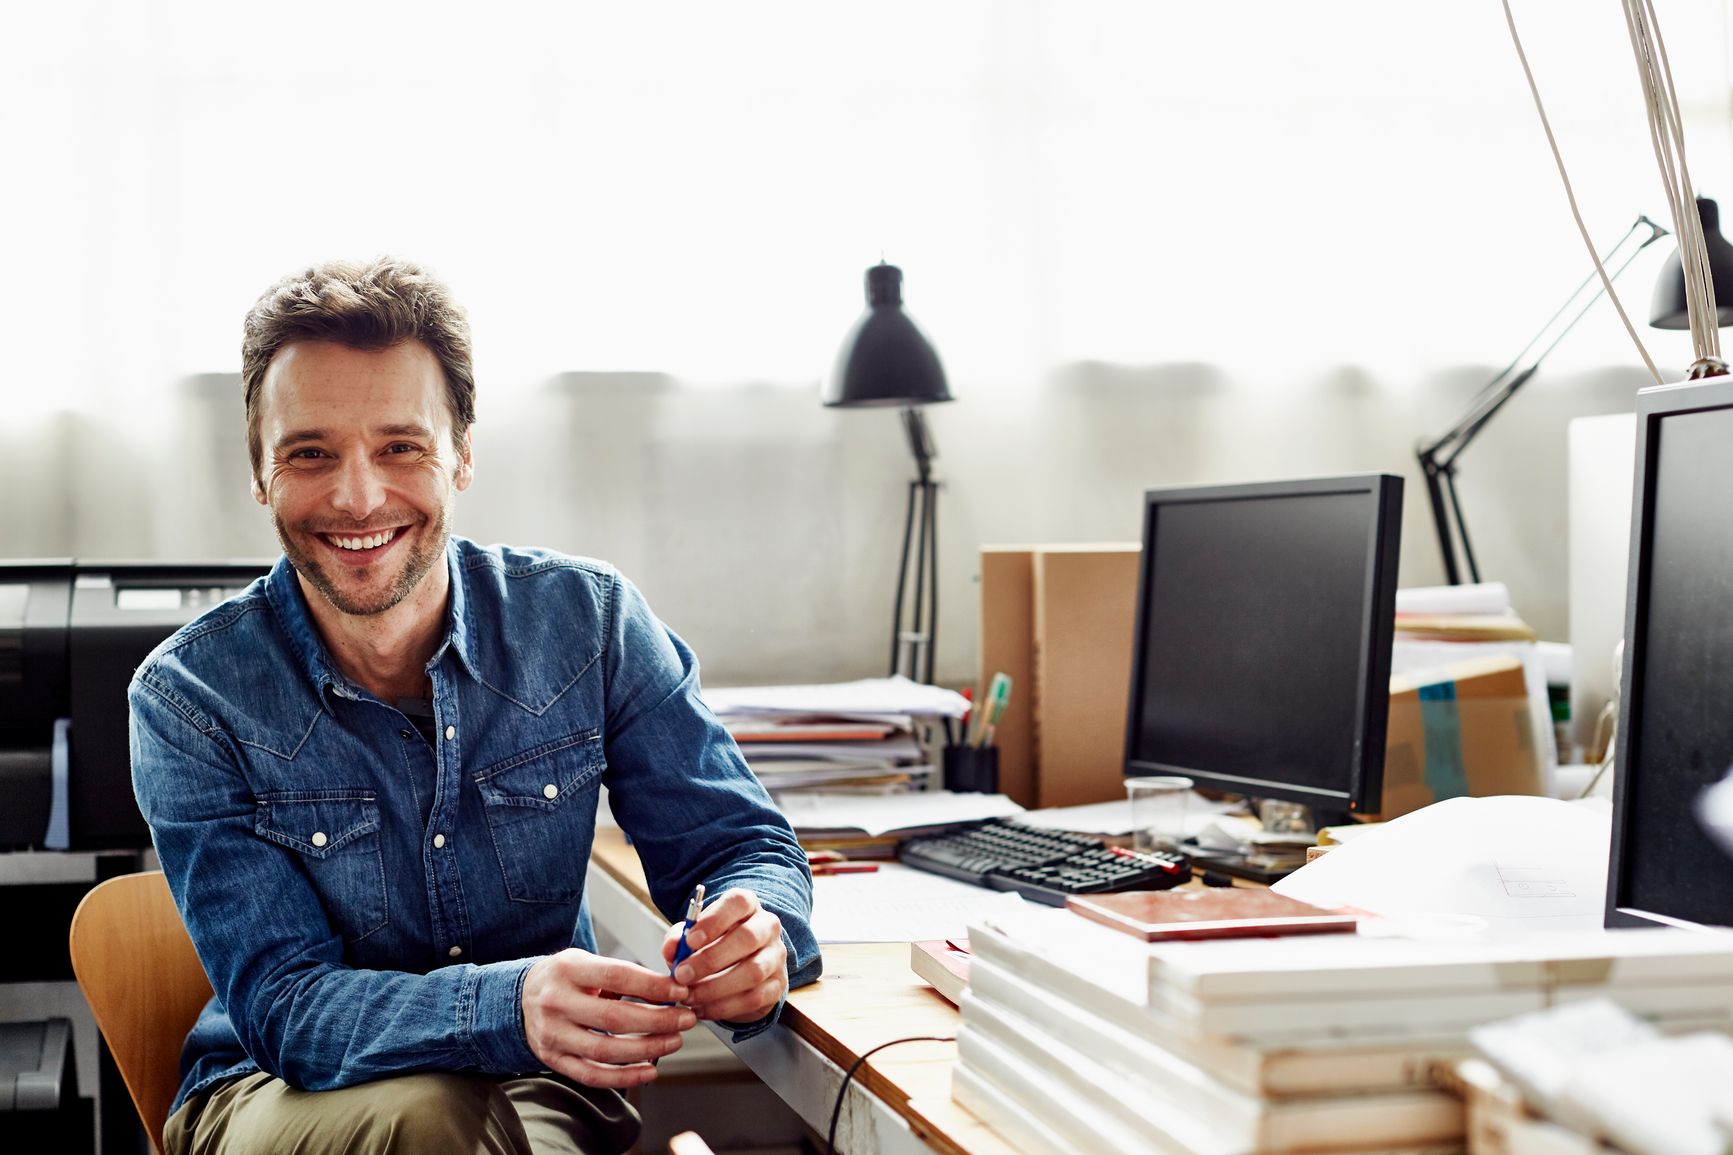 Portrait of smiling businessman sitting at desk in office